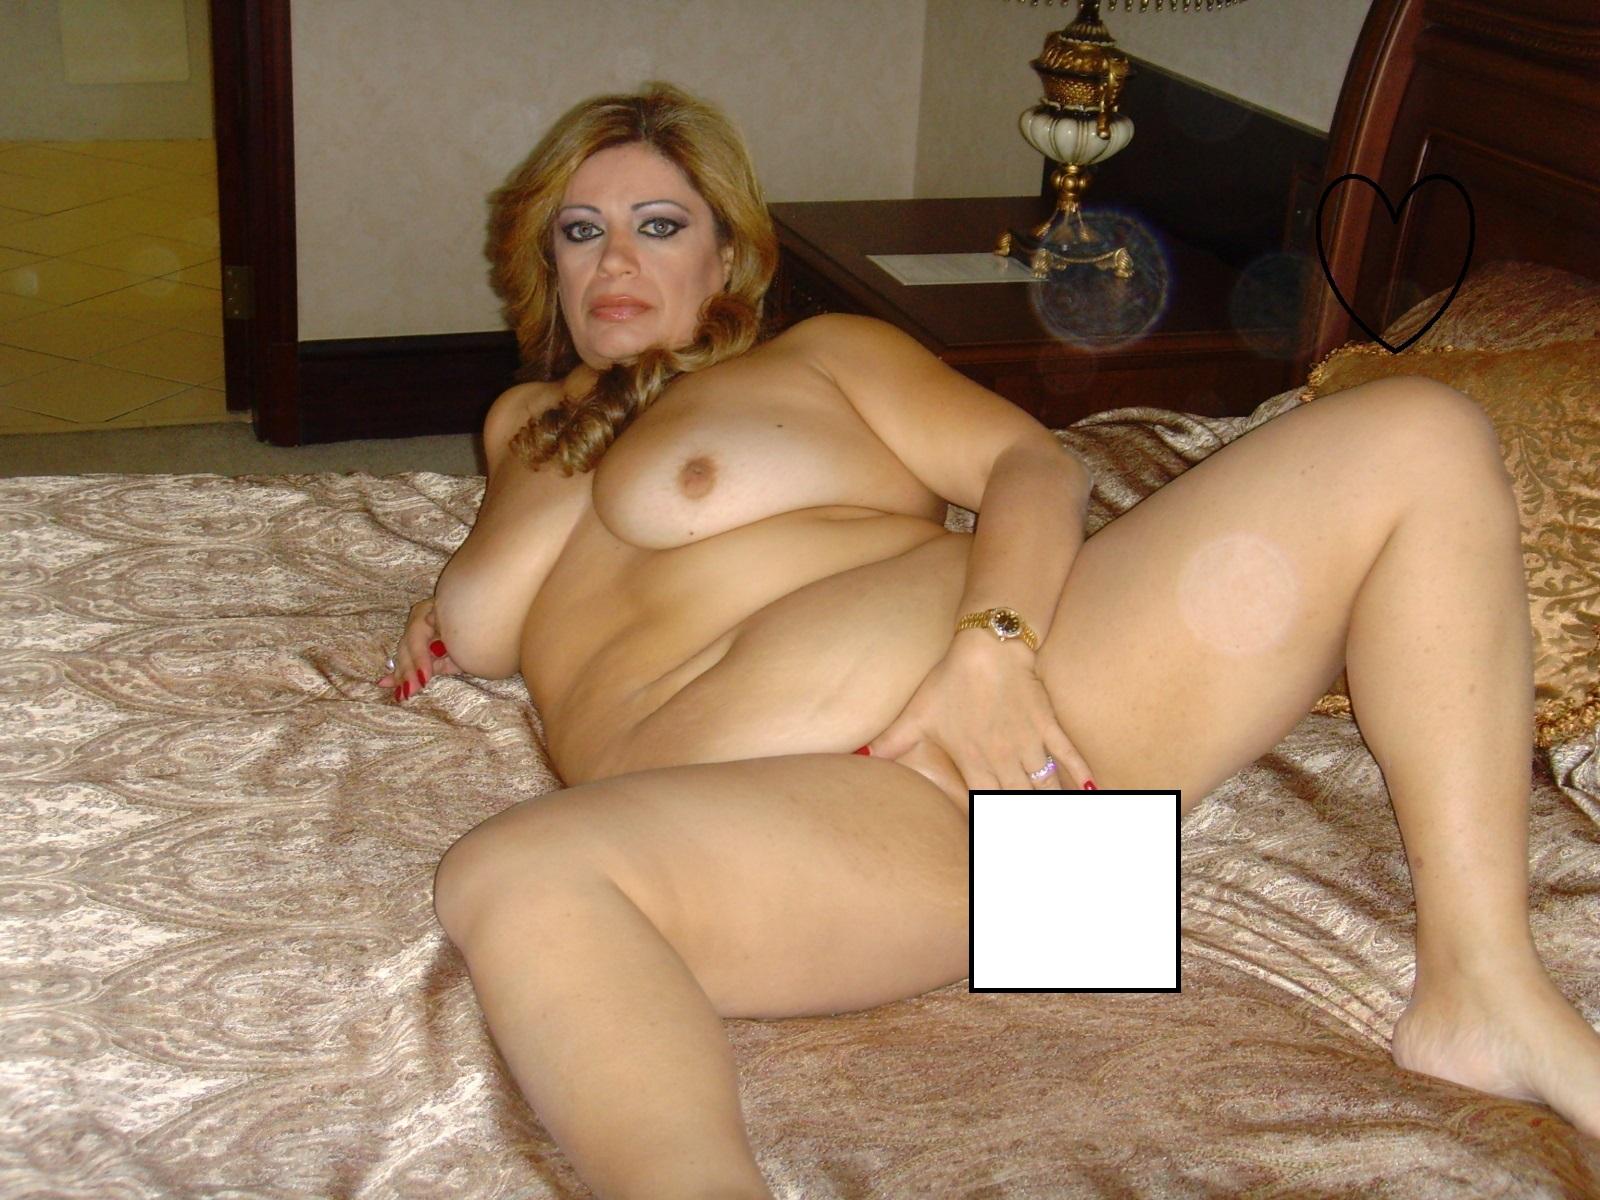 Maltese Amature Nude Pics 15